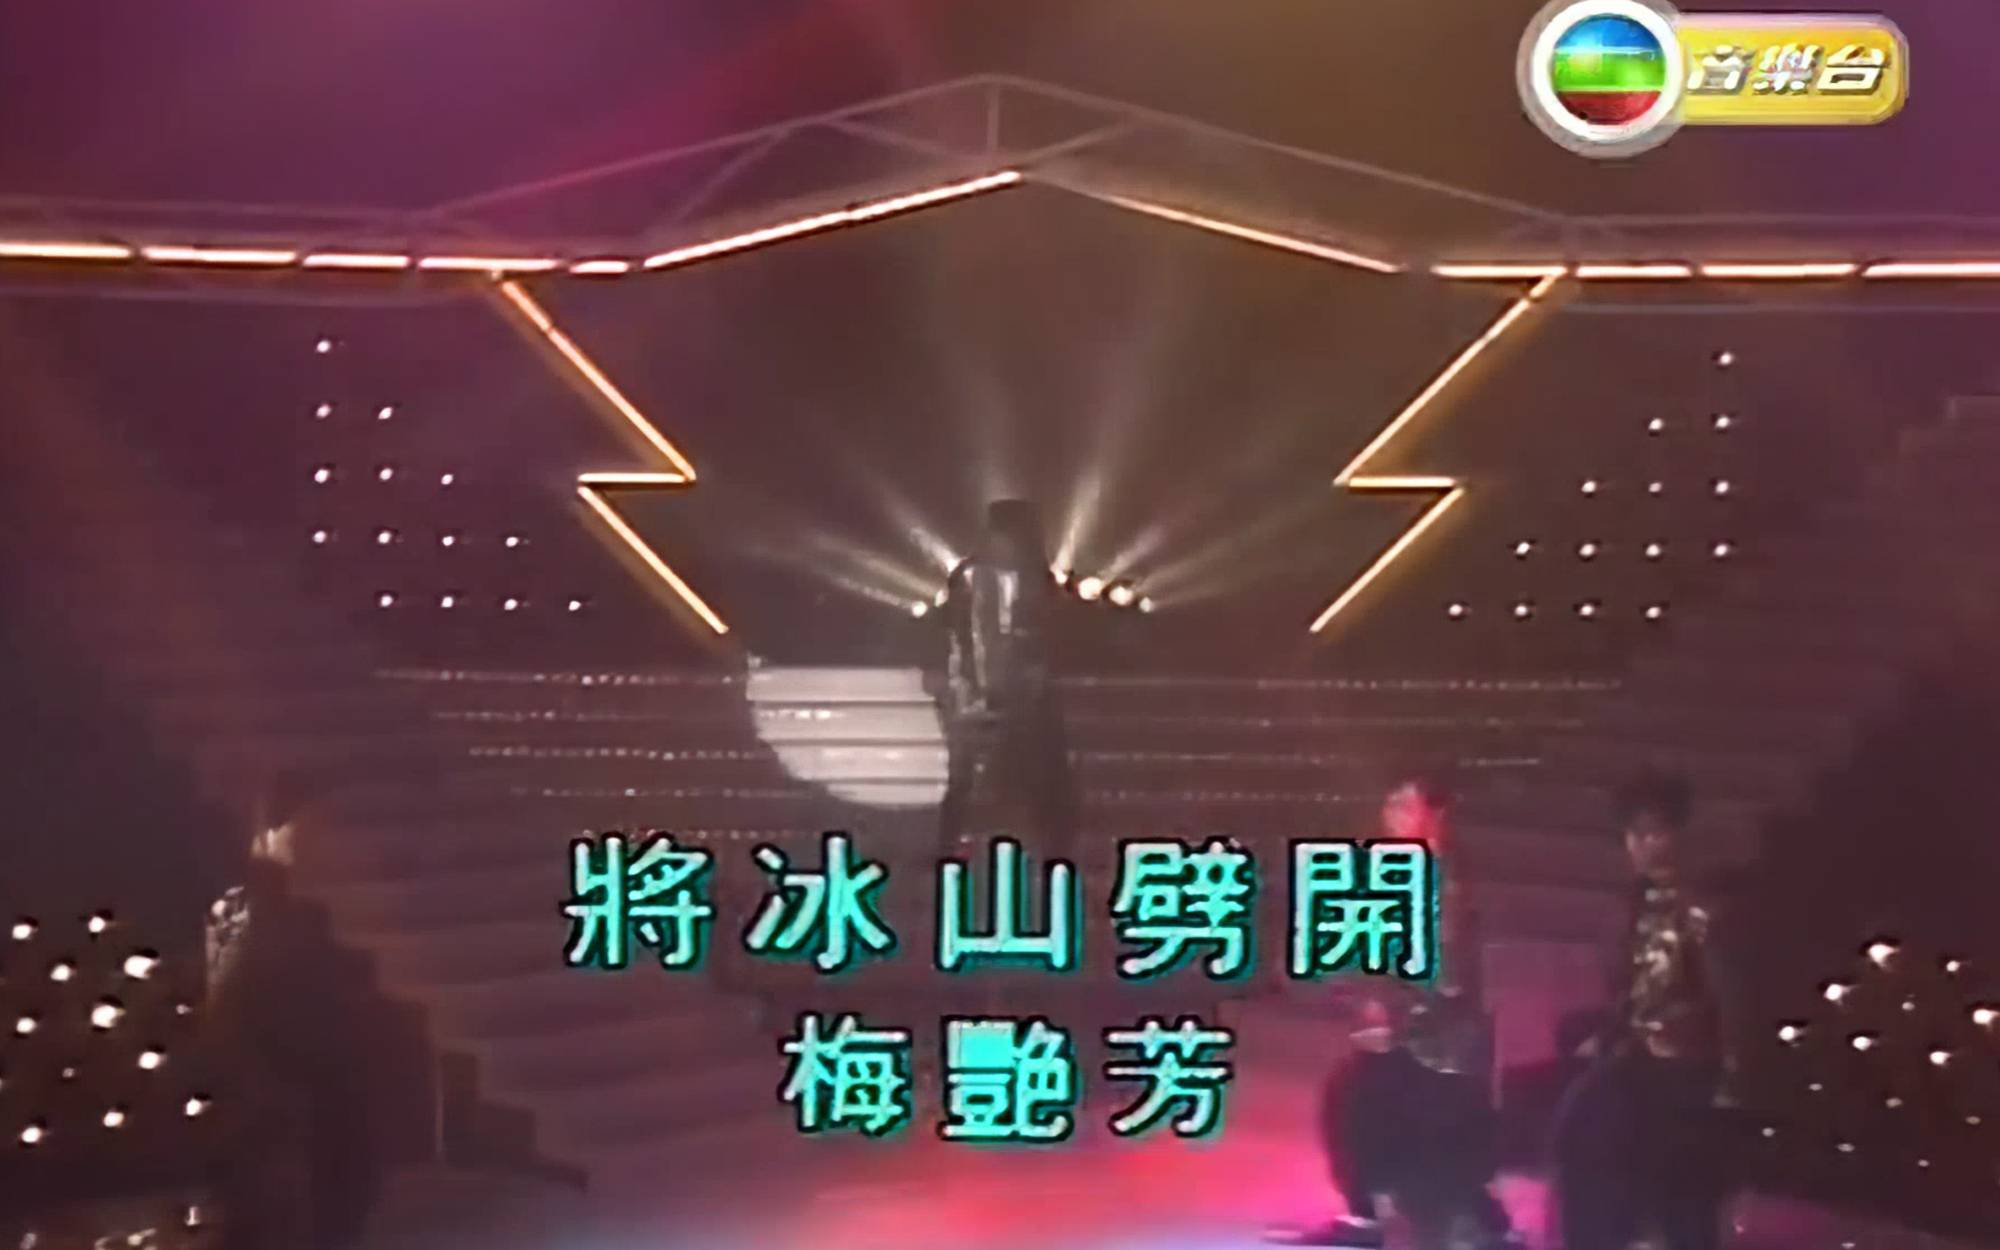 【1080p修复原生50帧】梅艳芳十大劲歌金曲季选1983—1990年